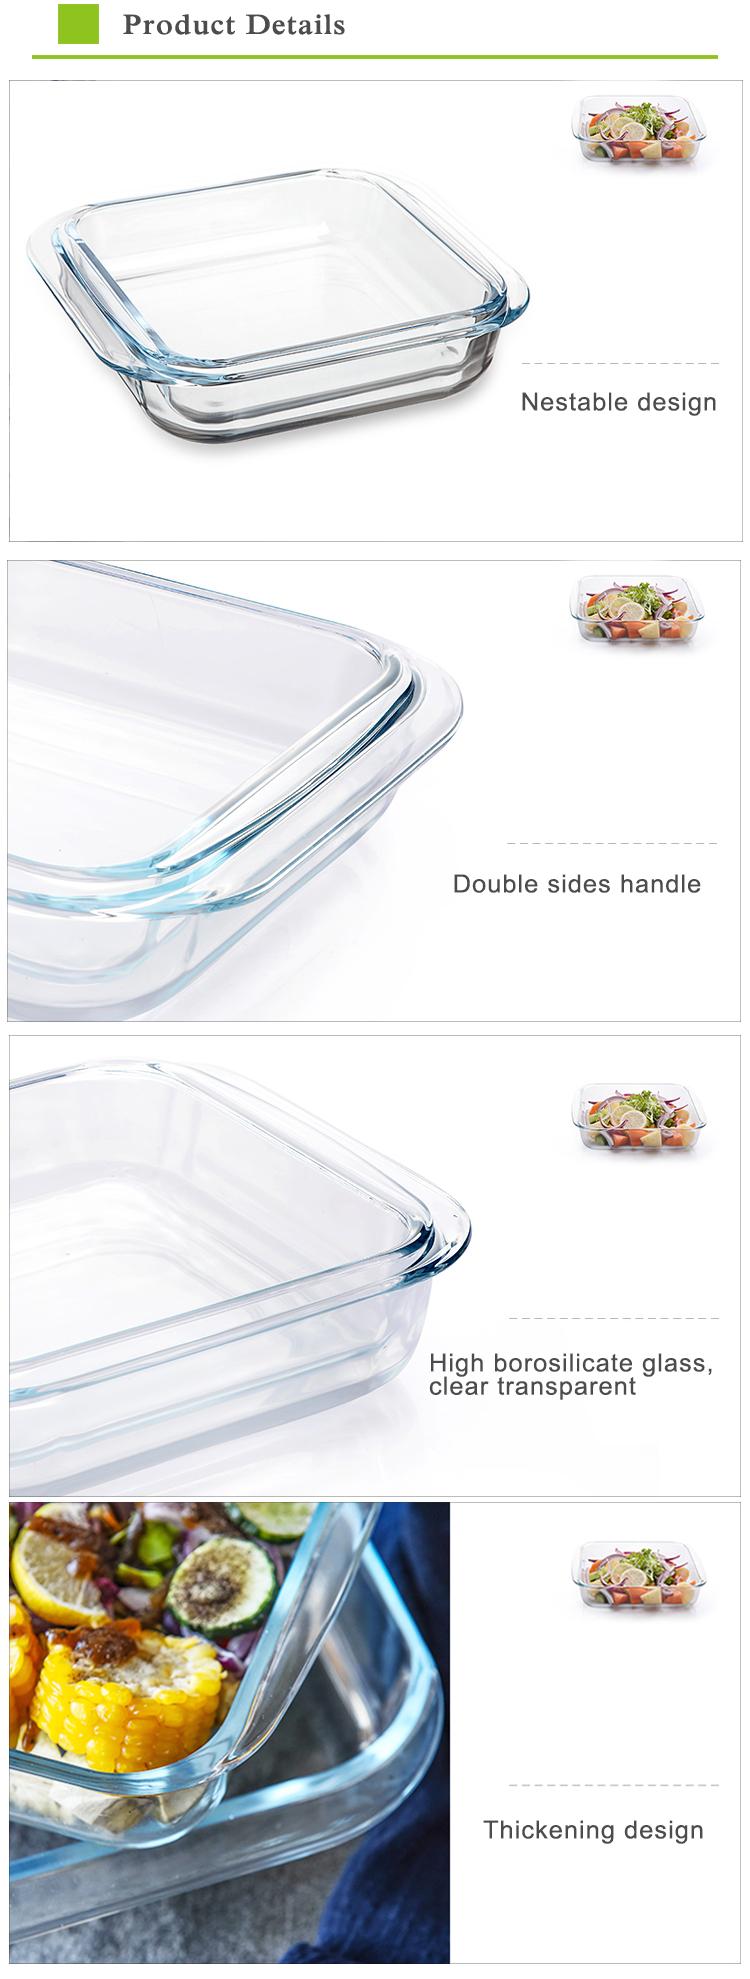 China factory wholesale oven safe high borosilicate baking dish glass square bake pan